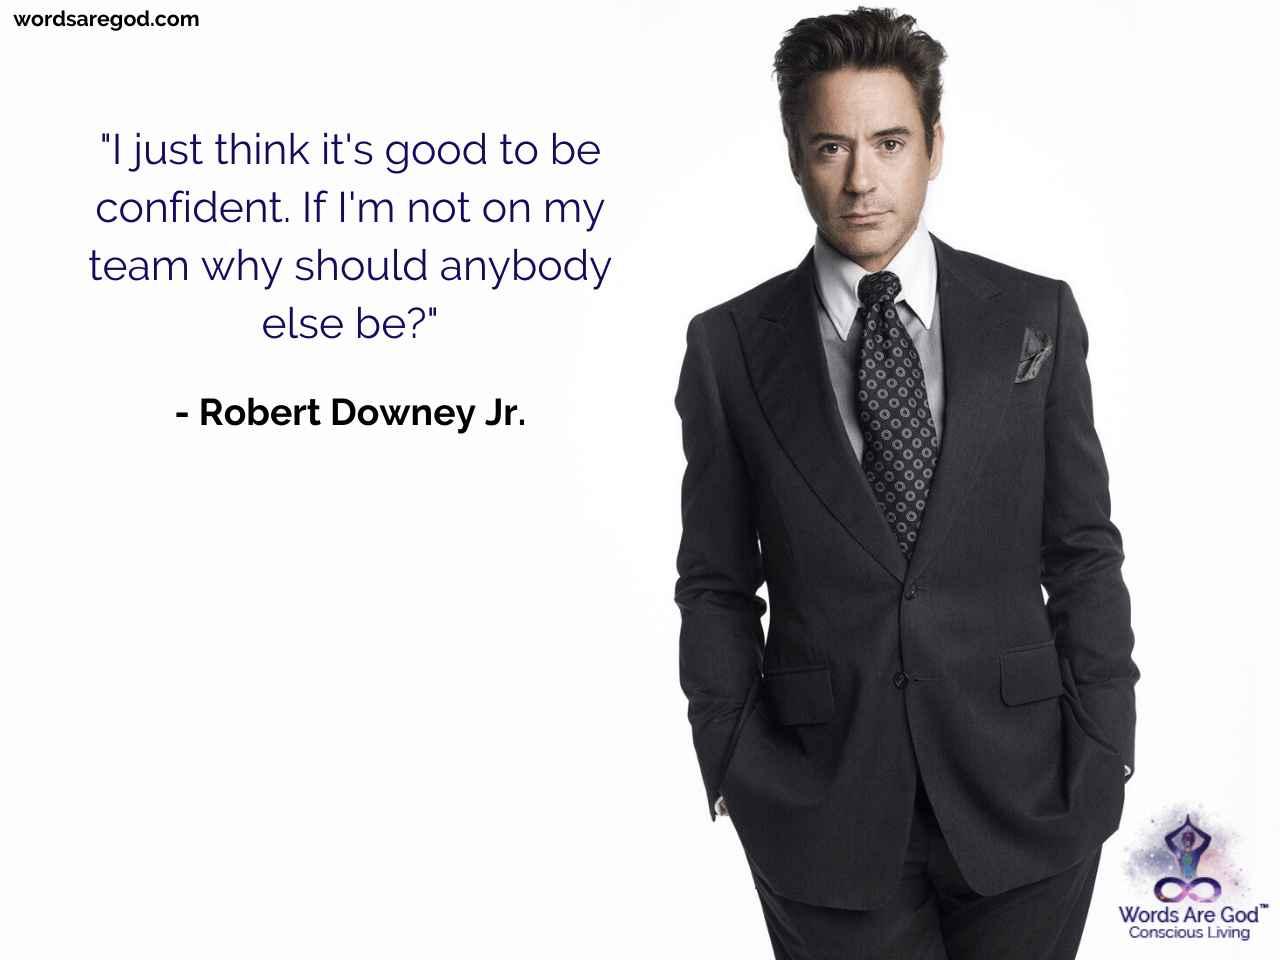 Robert Downey Jr. Life Quote